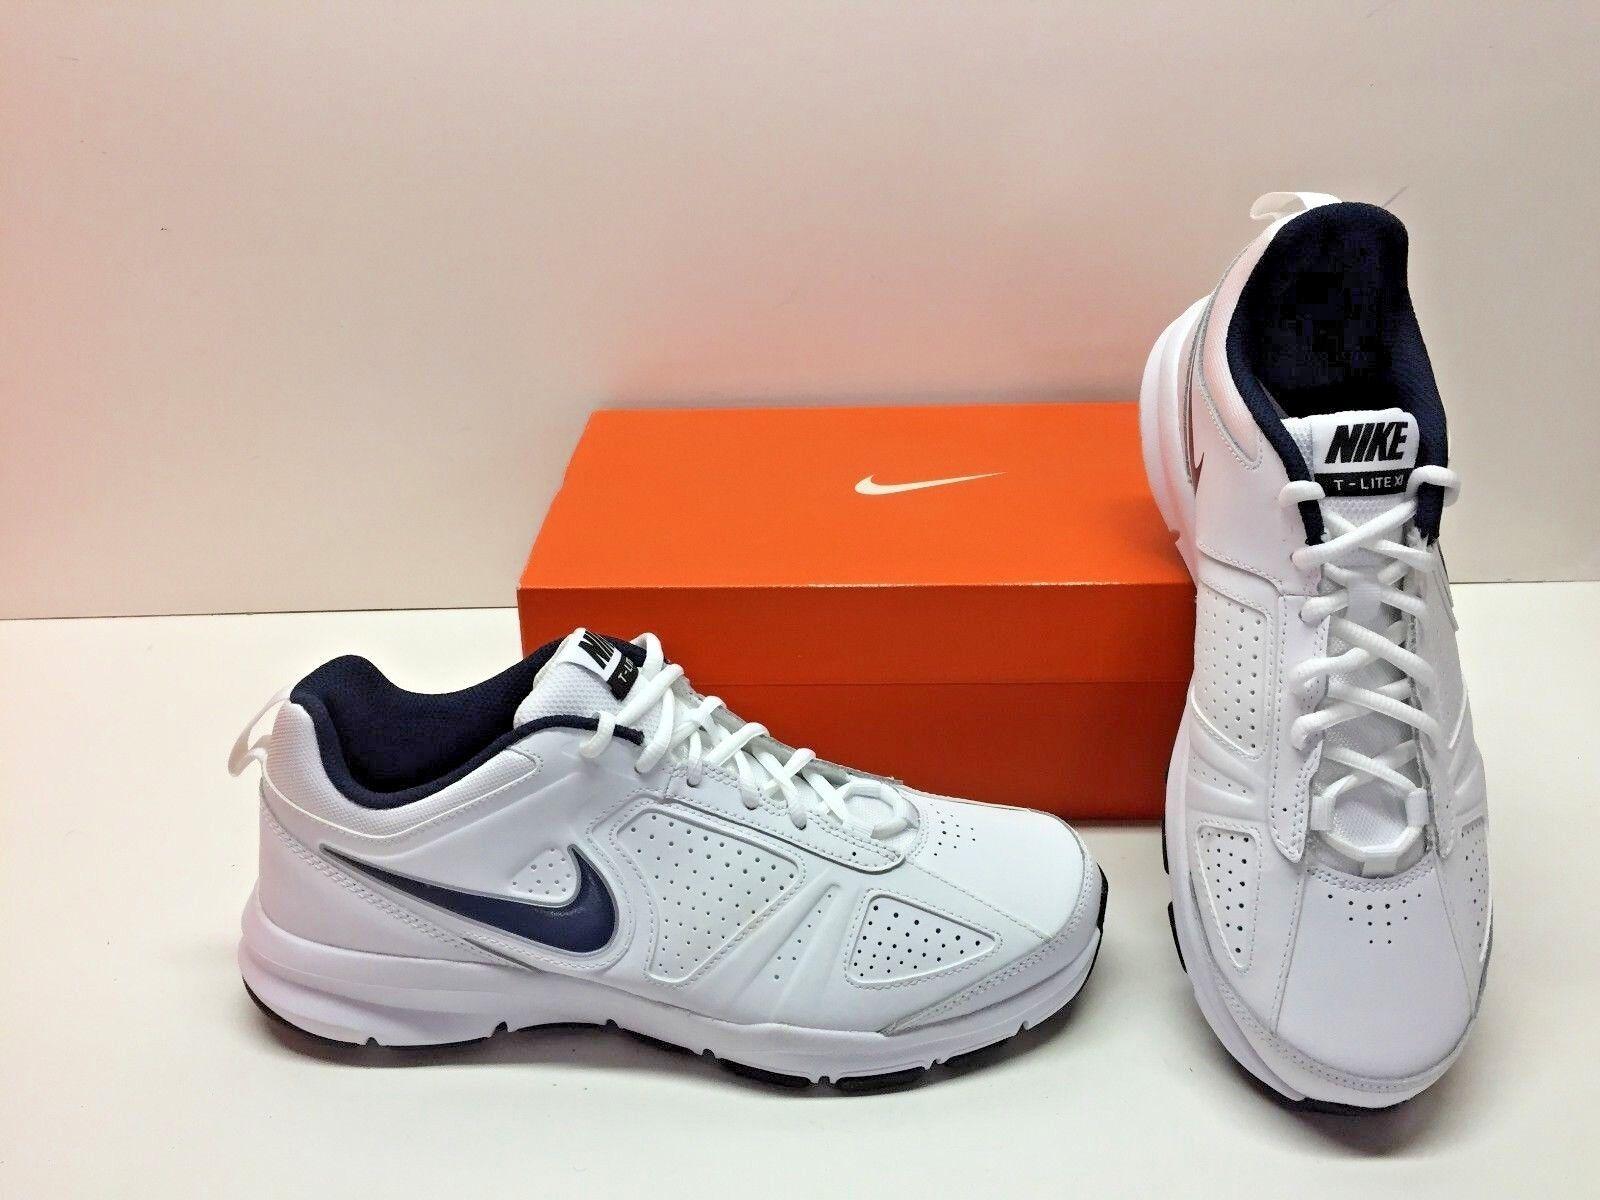 Nike t-lite xi scarpe 11 croce bianco nero formazione scarpe scarpe xi Uomo 10,5 90d1a0